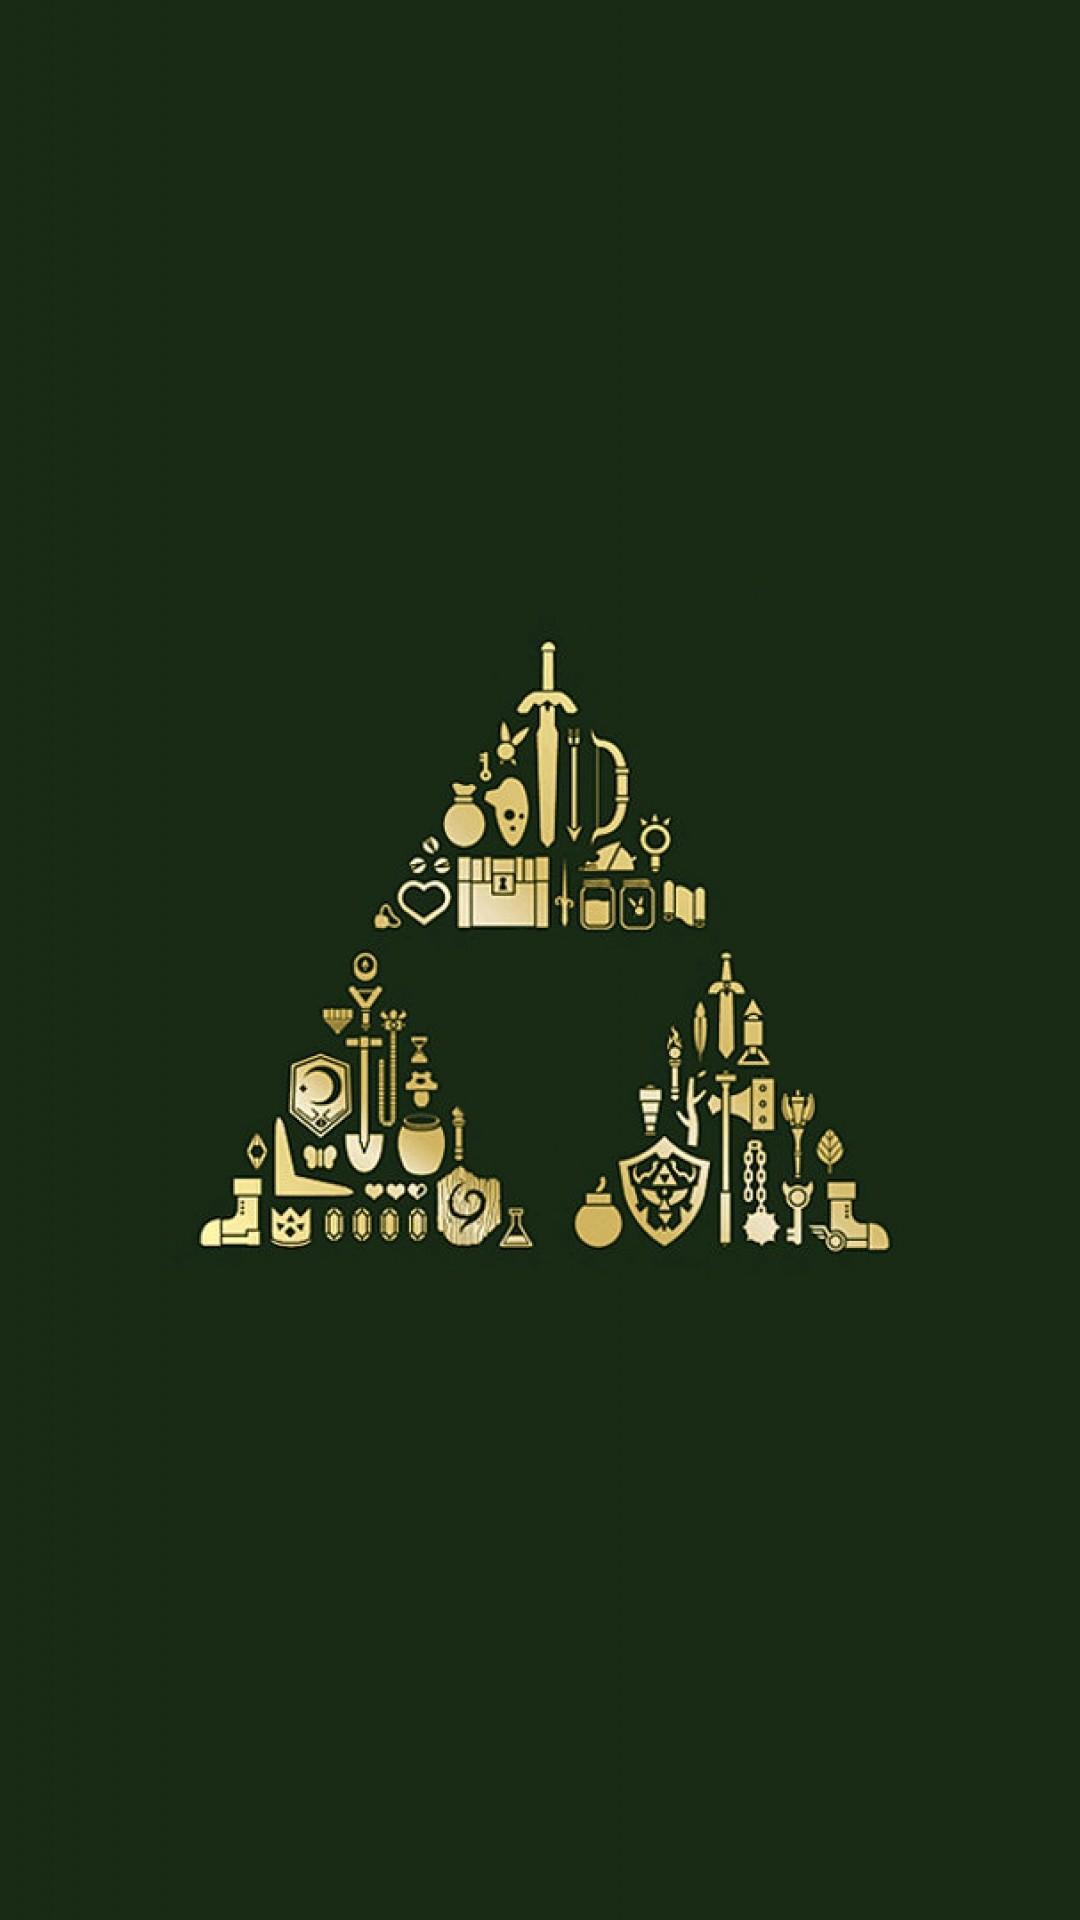 Zelda Phone Wallpaper ·① WallpaperTag